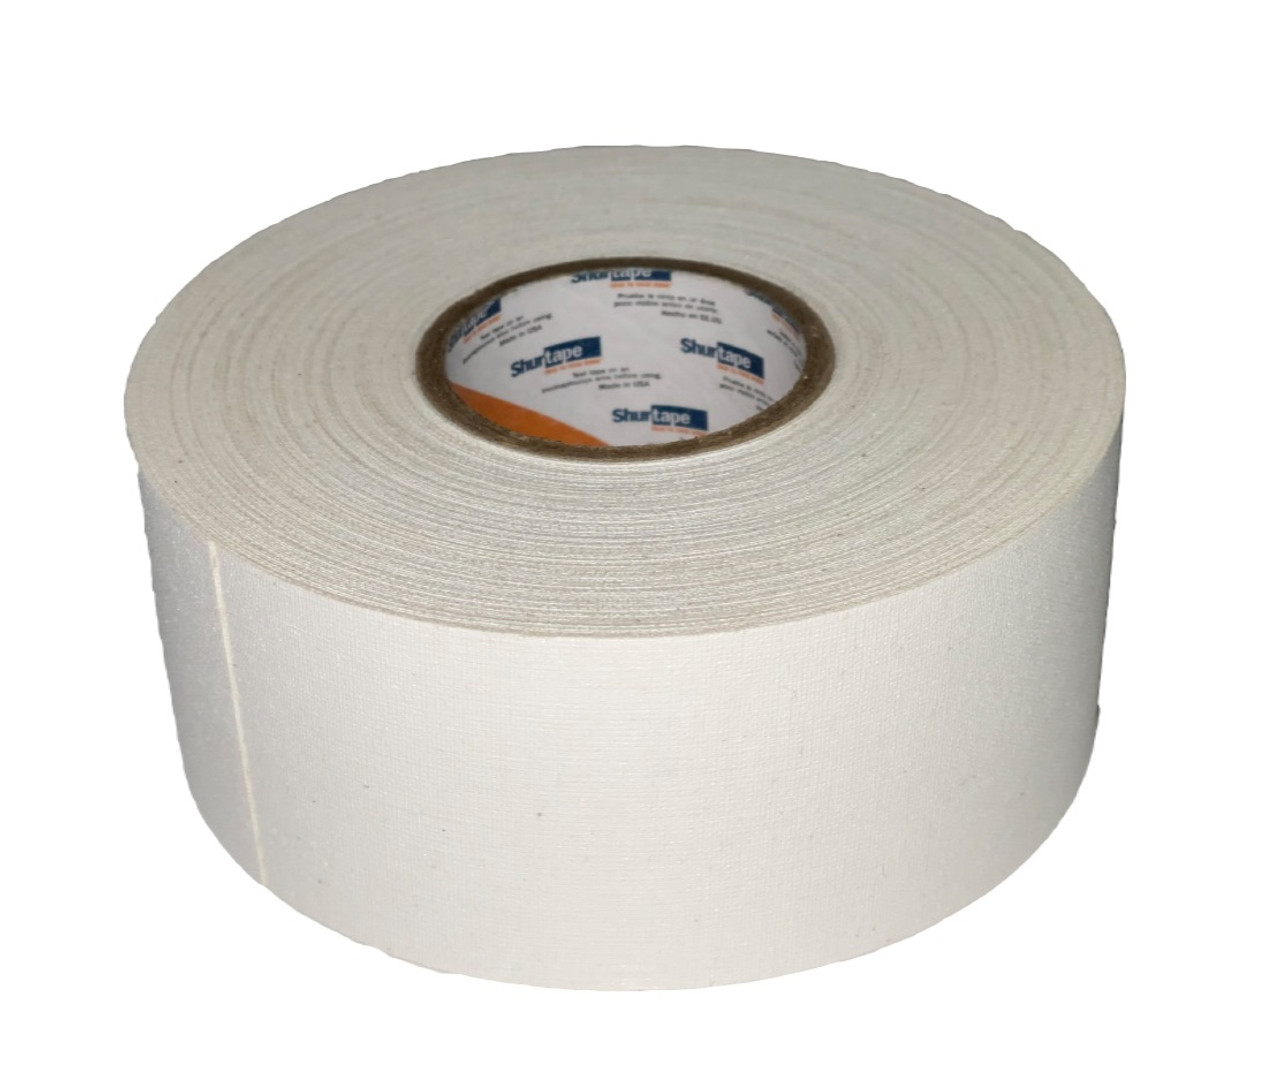 "Pro Gaffers Tape - White 2"" x 25 Yds"